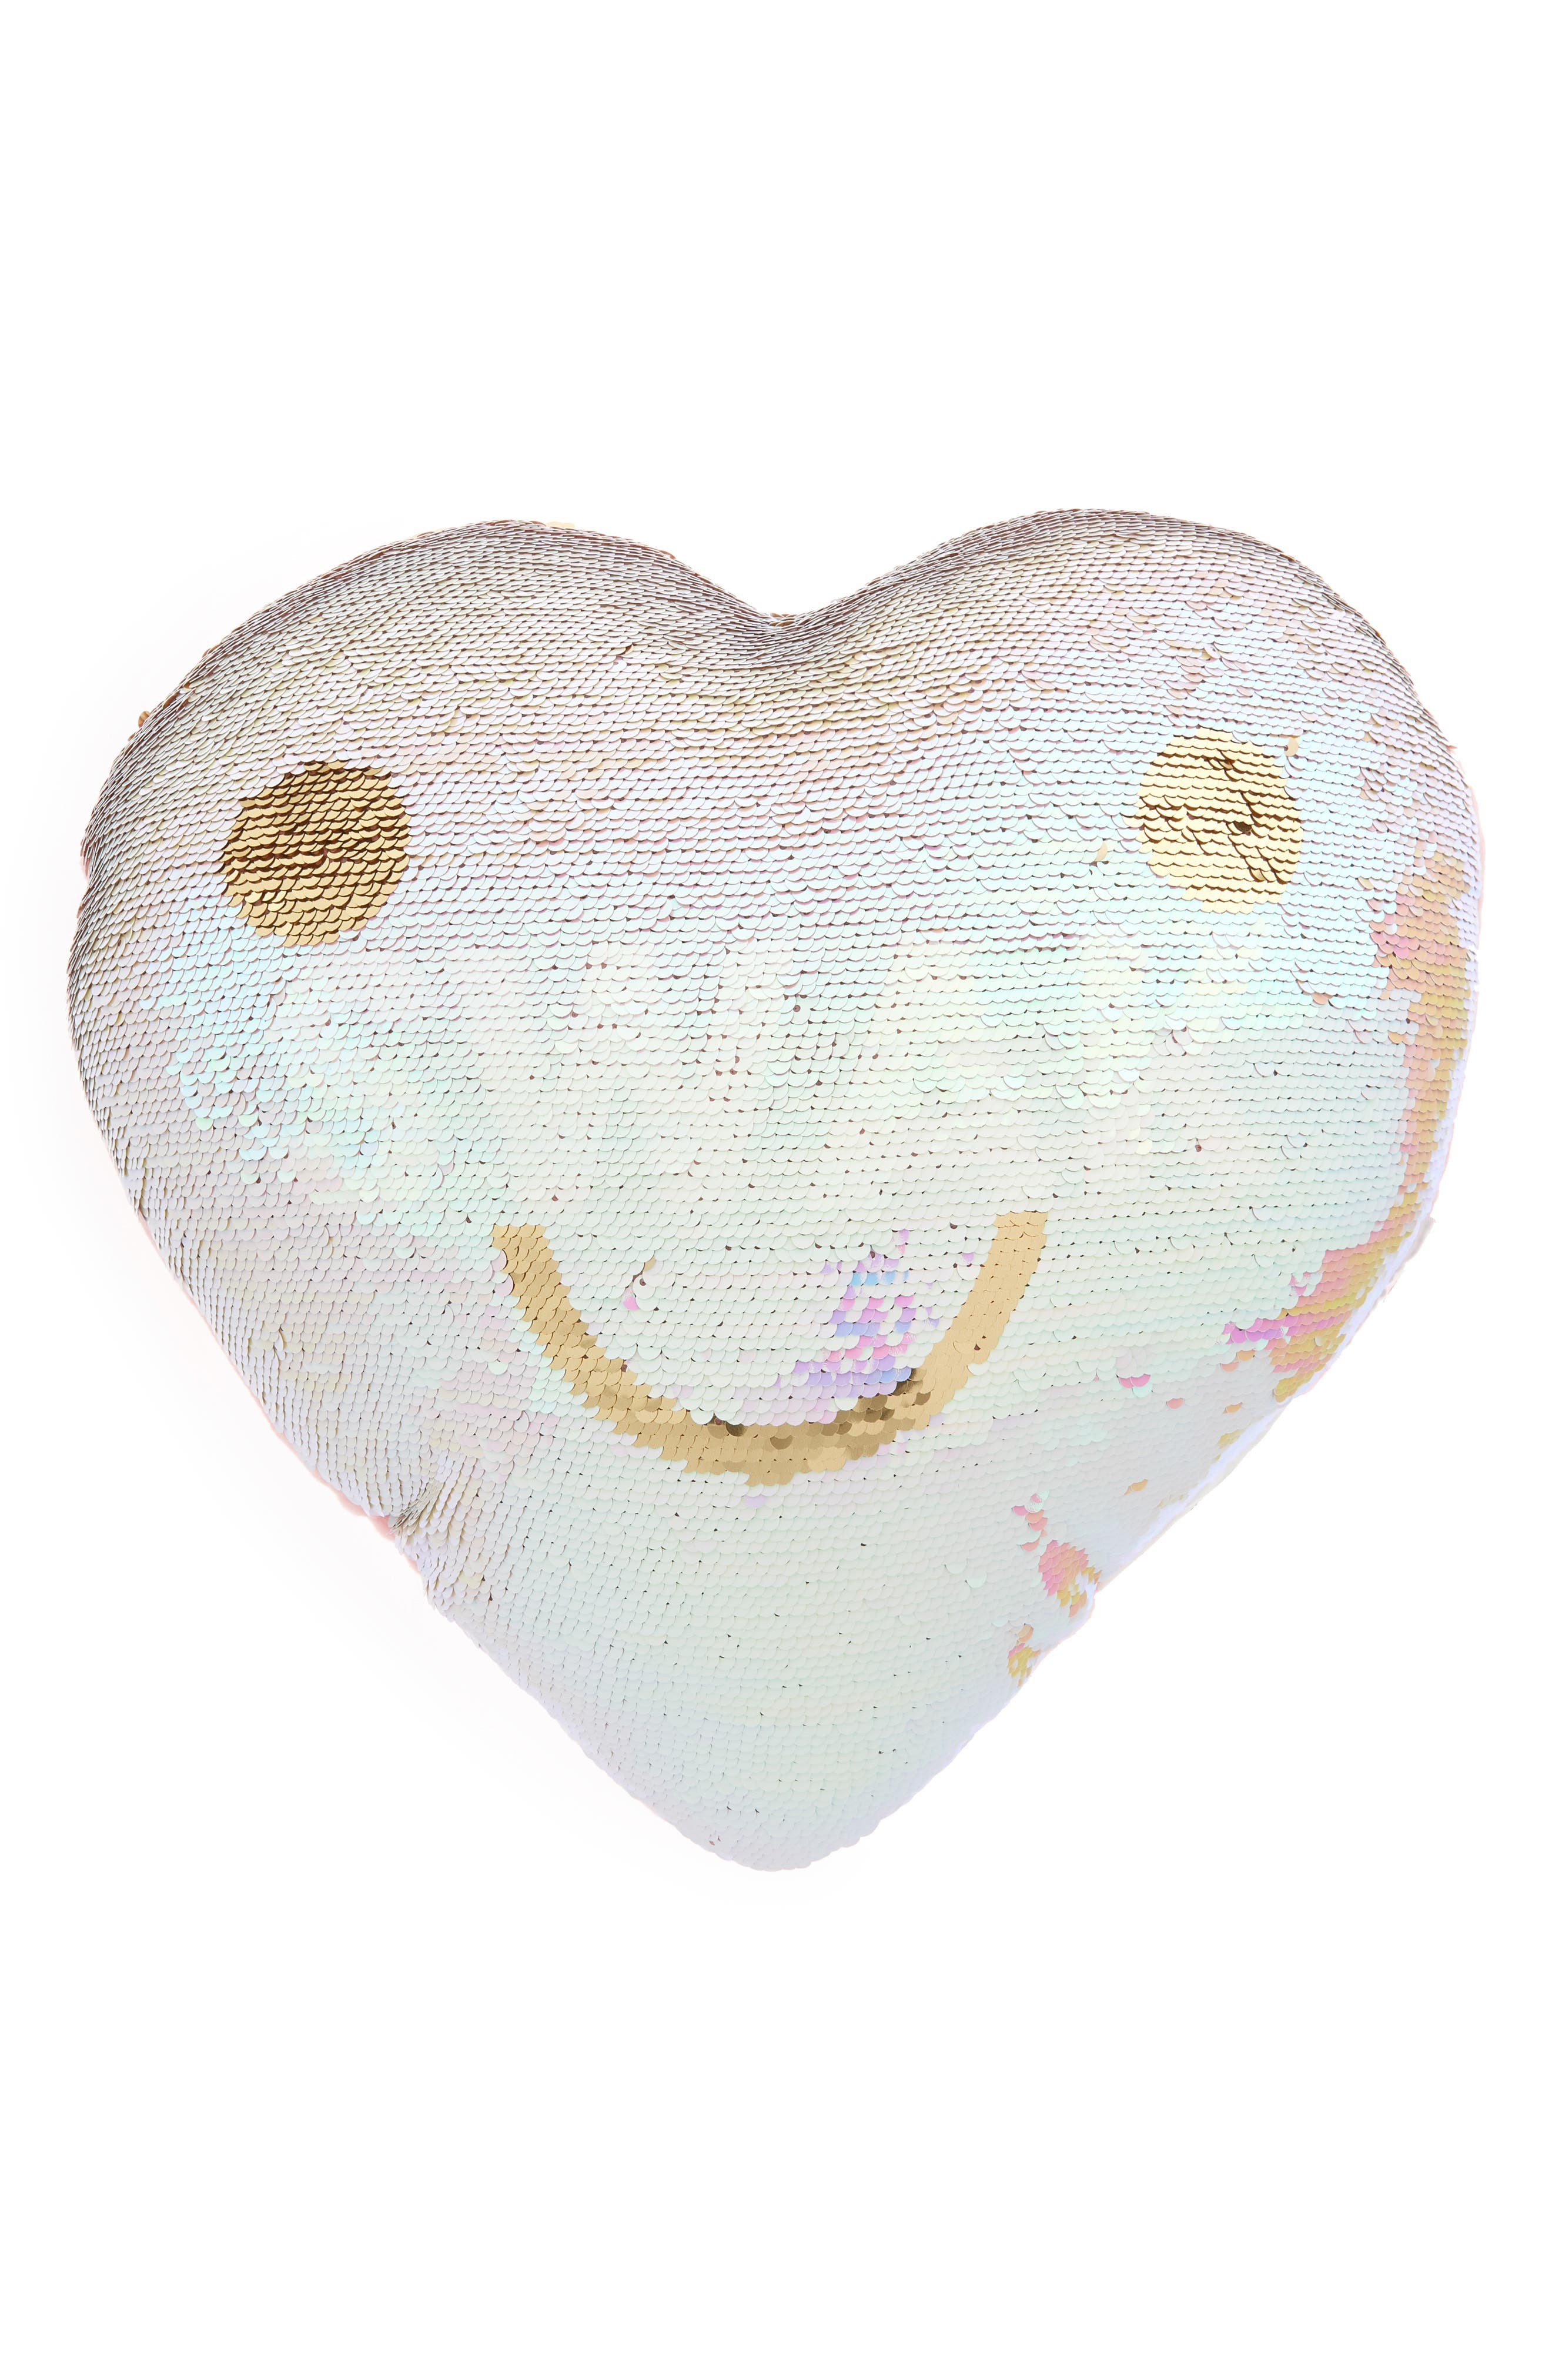 Flip Sequin Love Pillow,                             Main thumbnail 1, color,                             ROSE GOLD